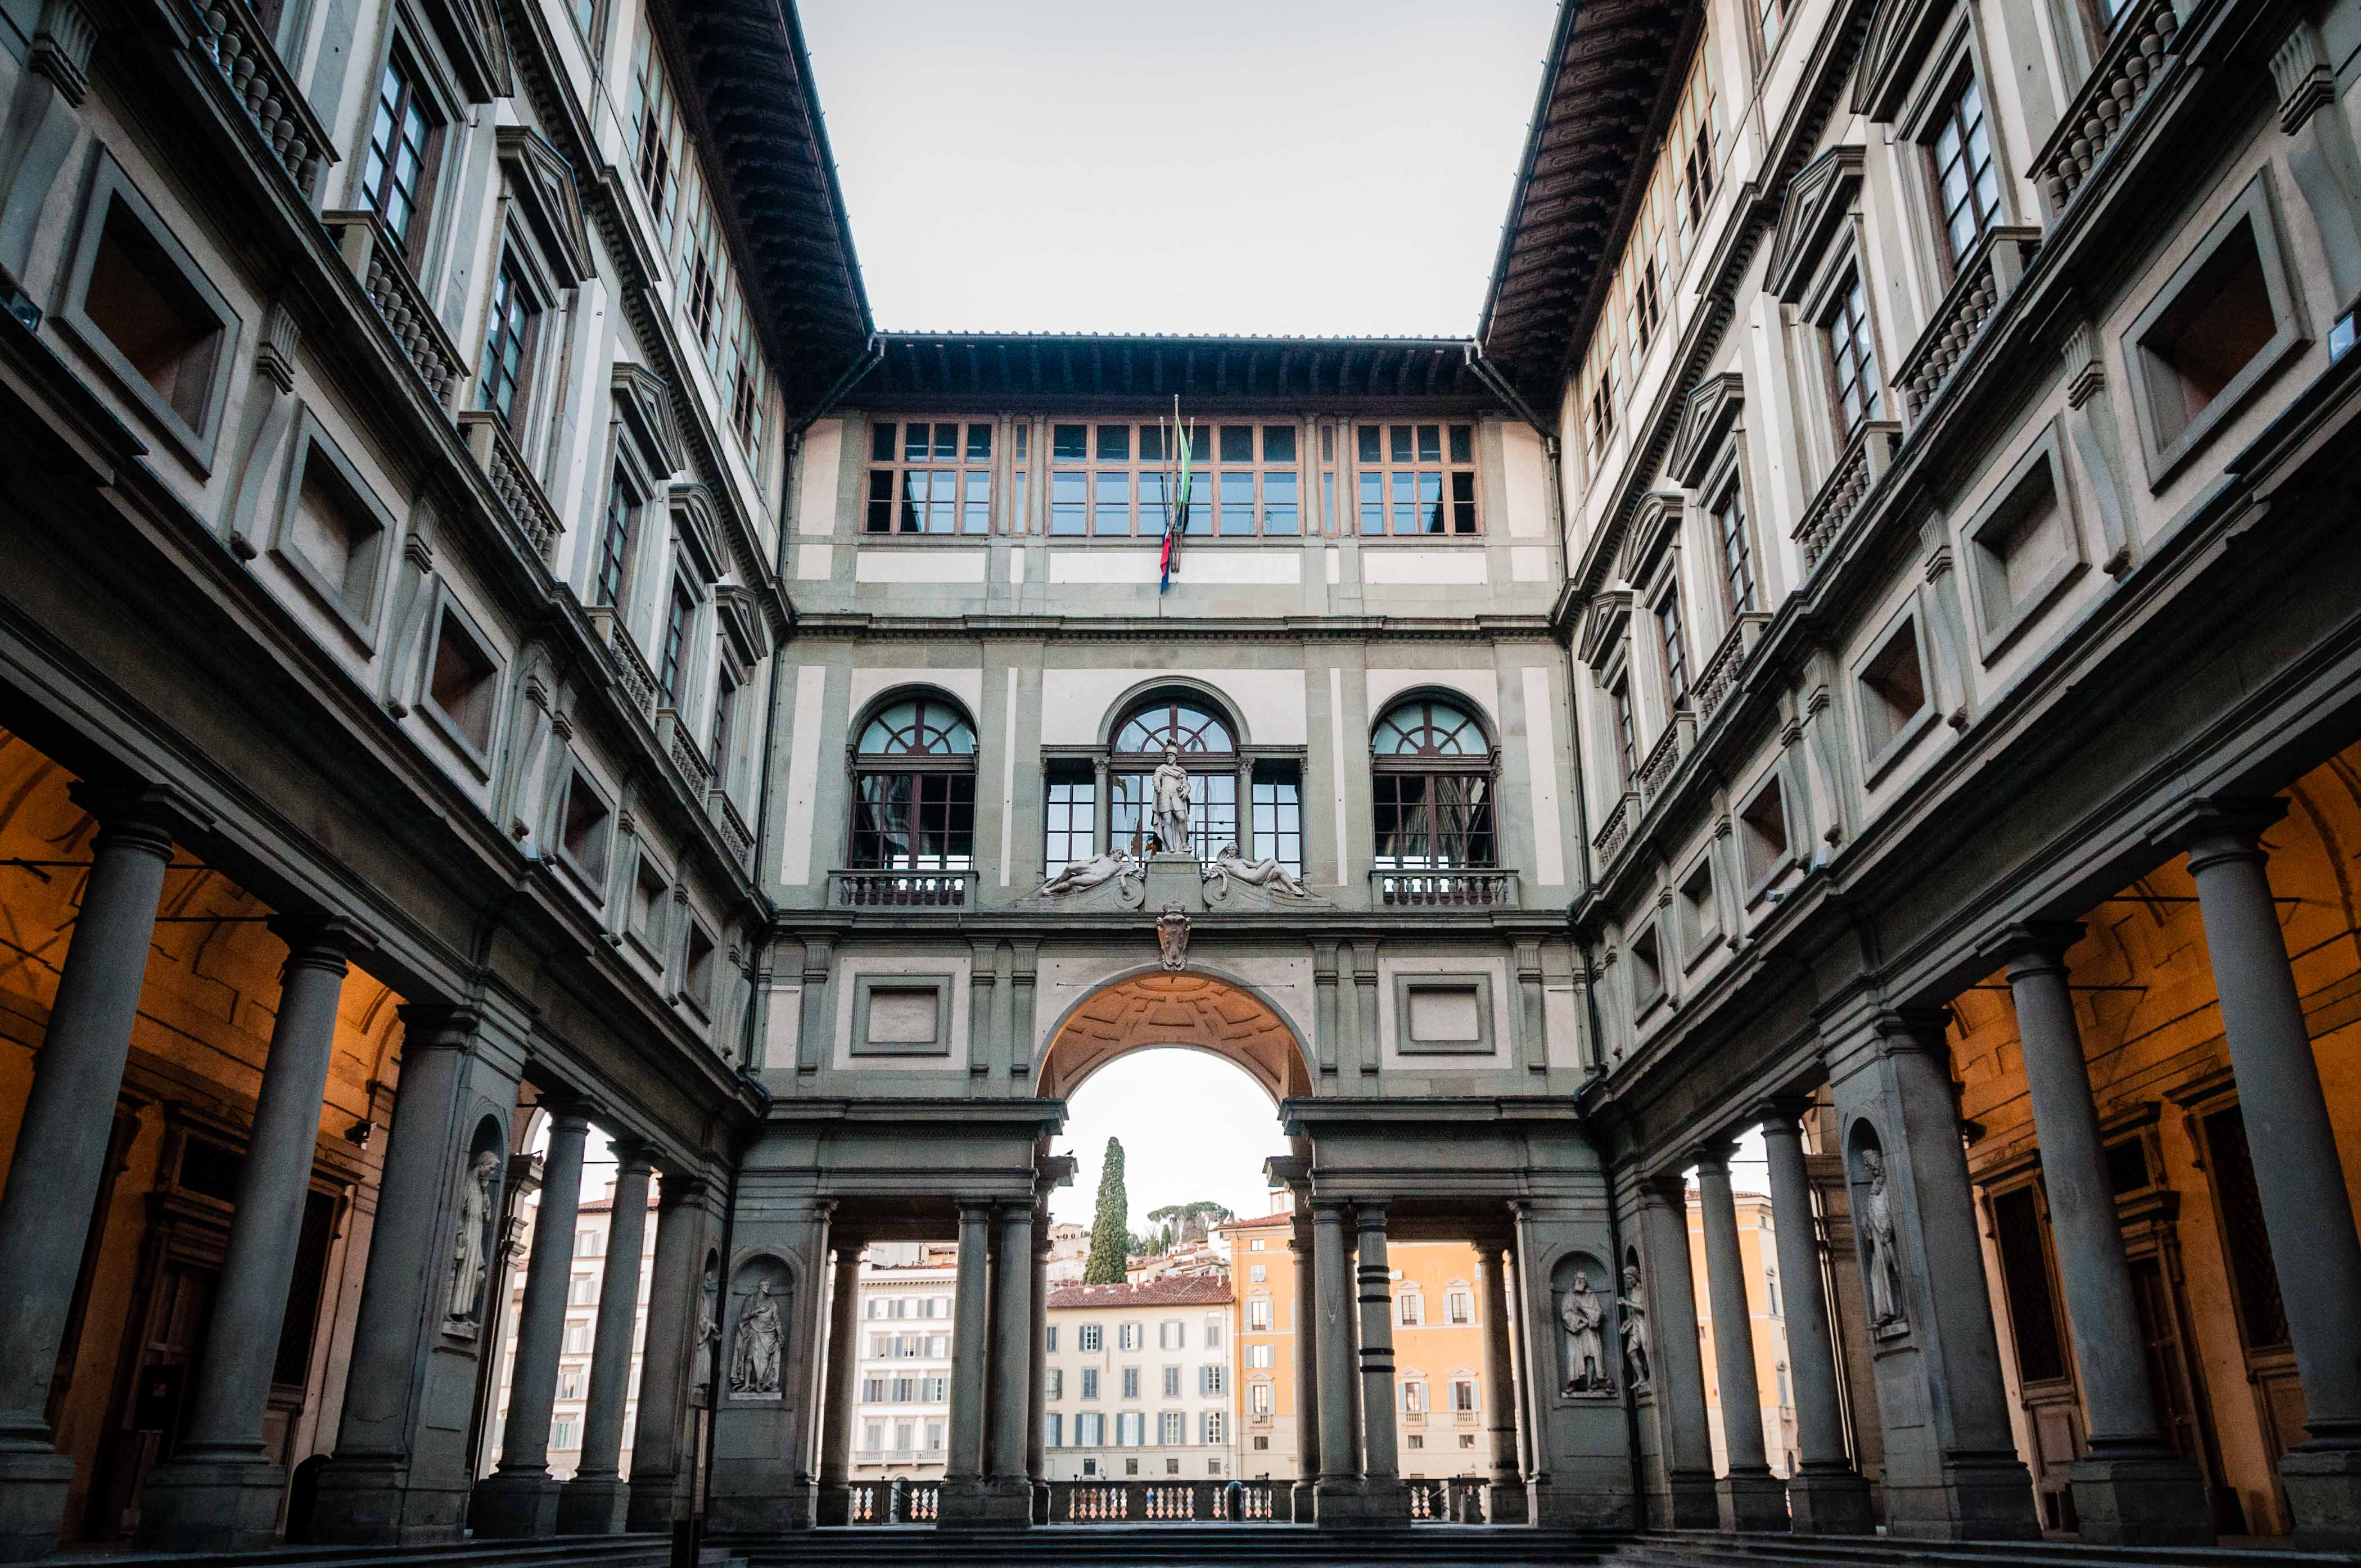 Музеи Европы - Галерея Уффици во Флоренции